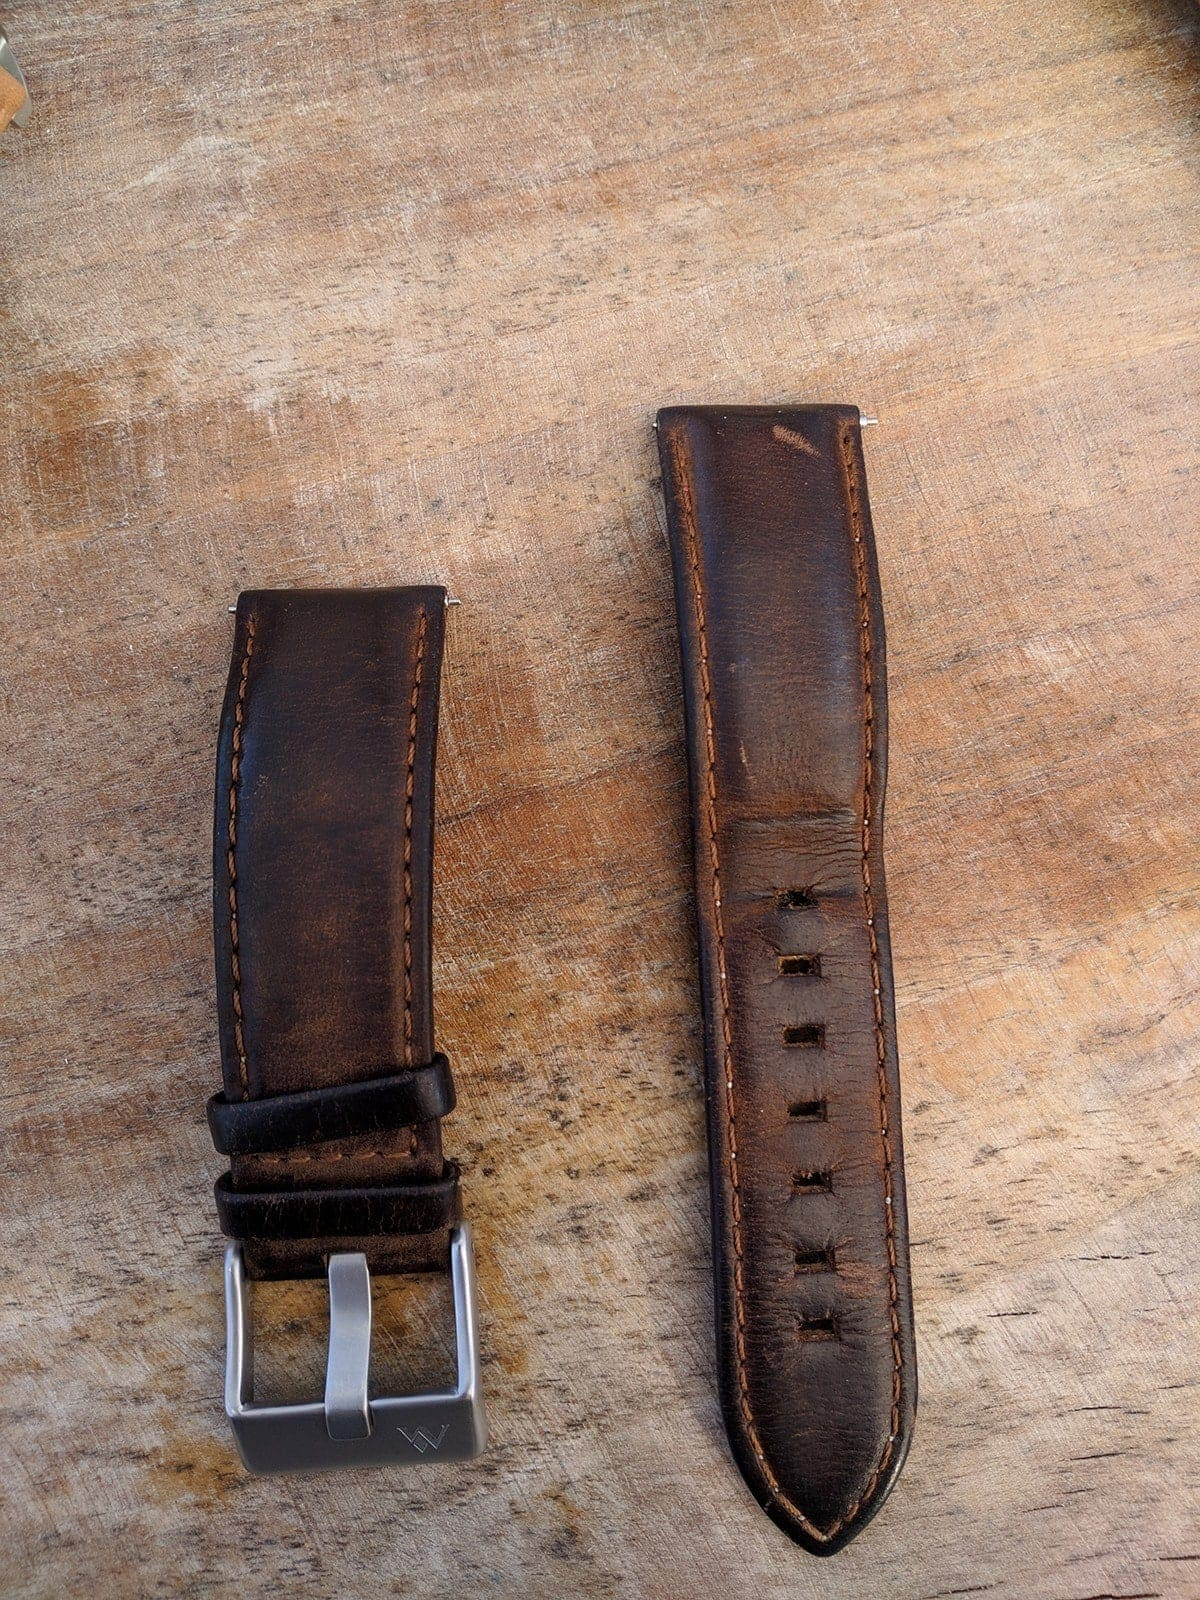 hazelnut brown leather strap in vintage style